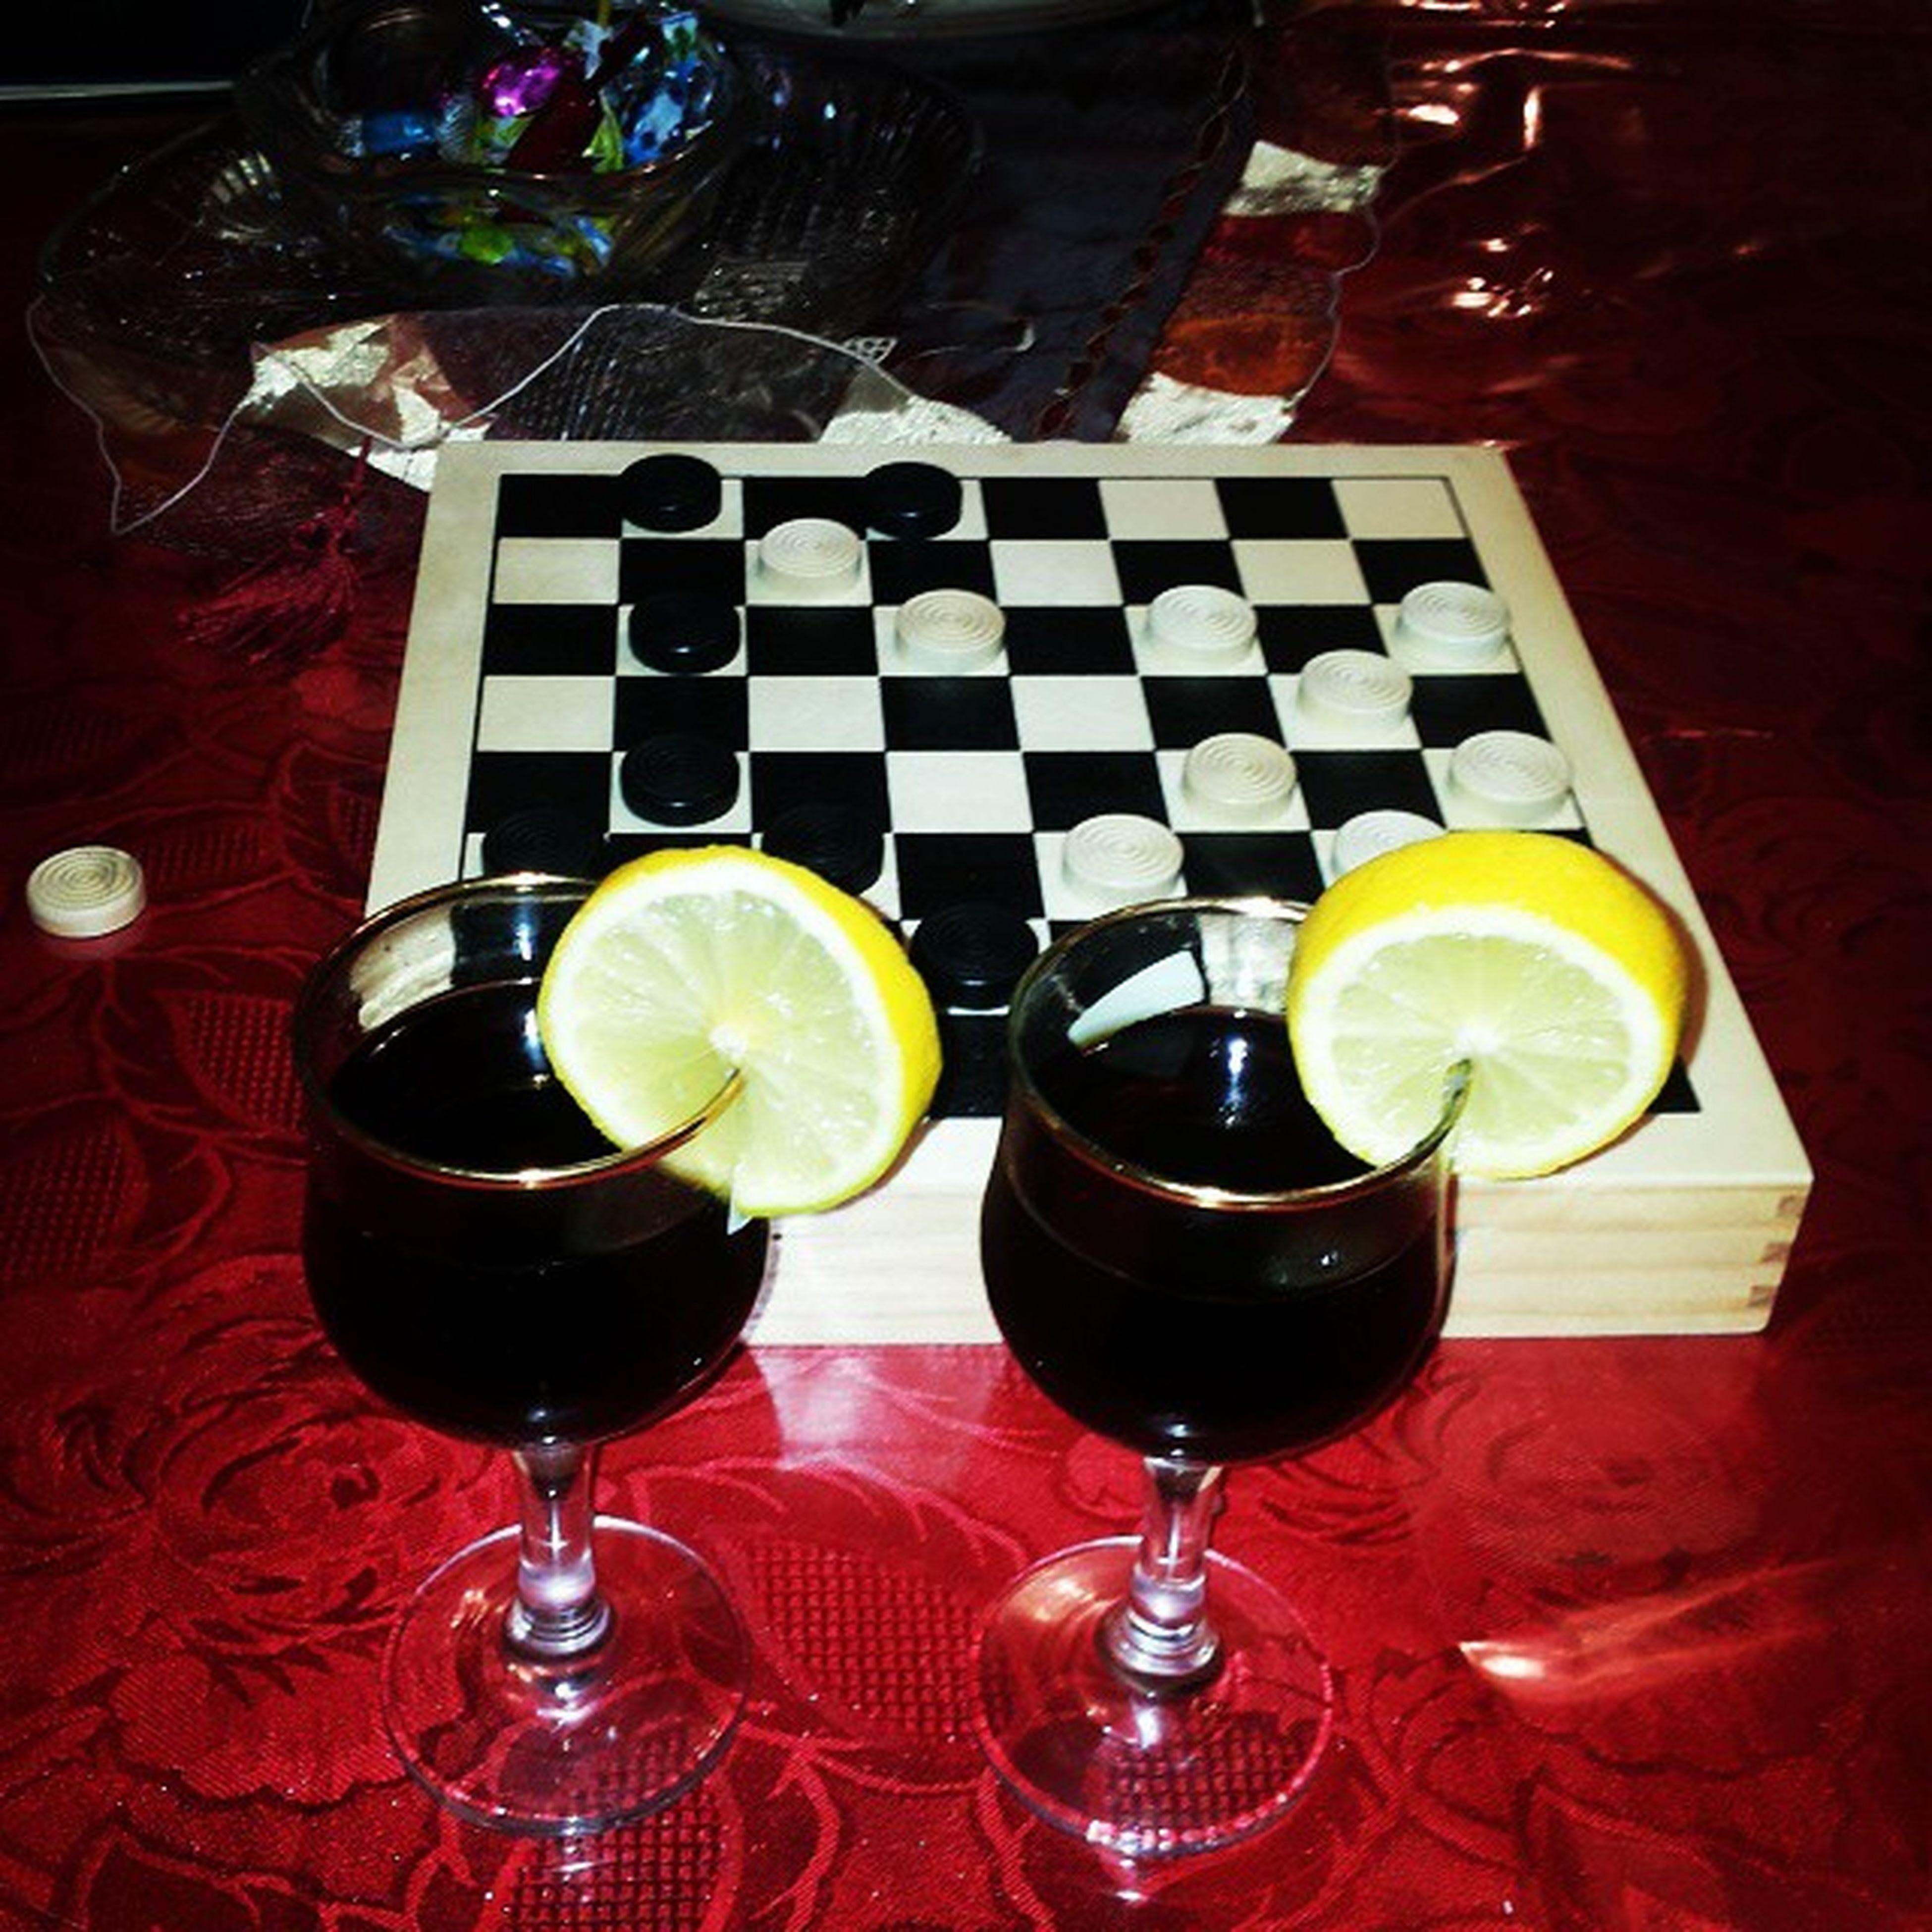 Drink Time Dama Pedine Bianconero Limone Cocacola Christmas Family Love